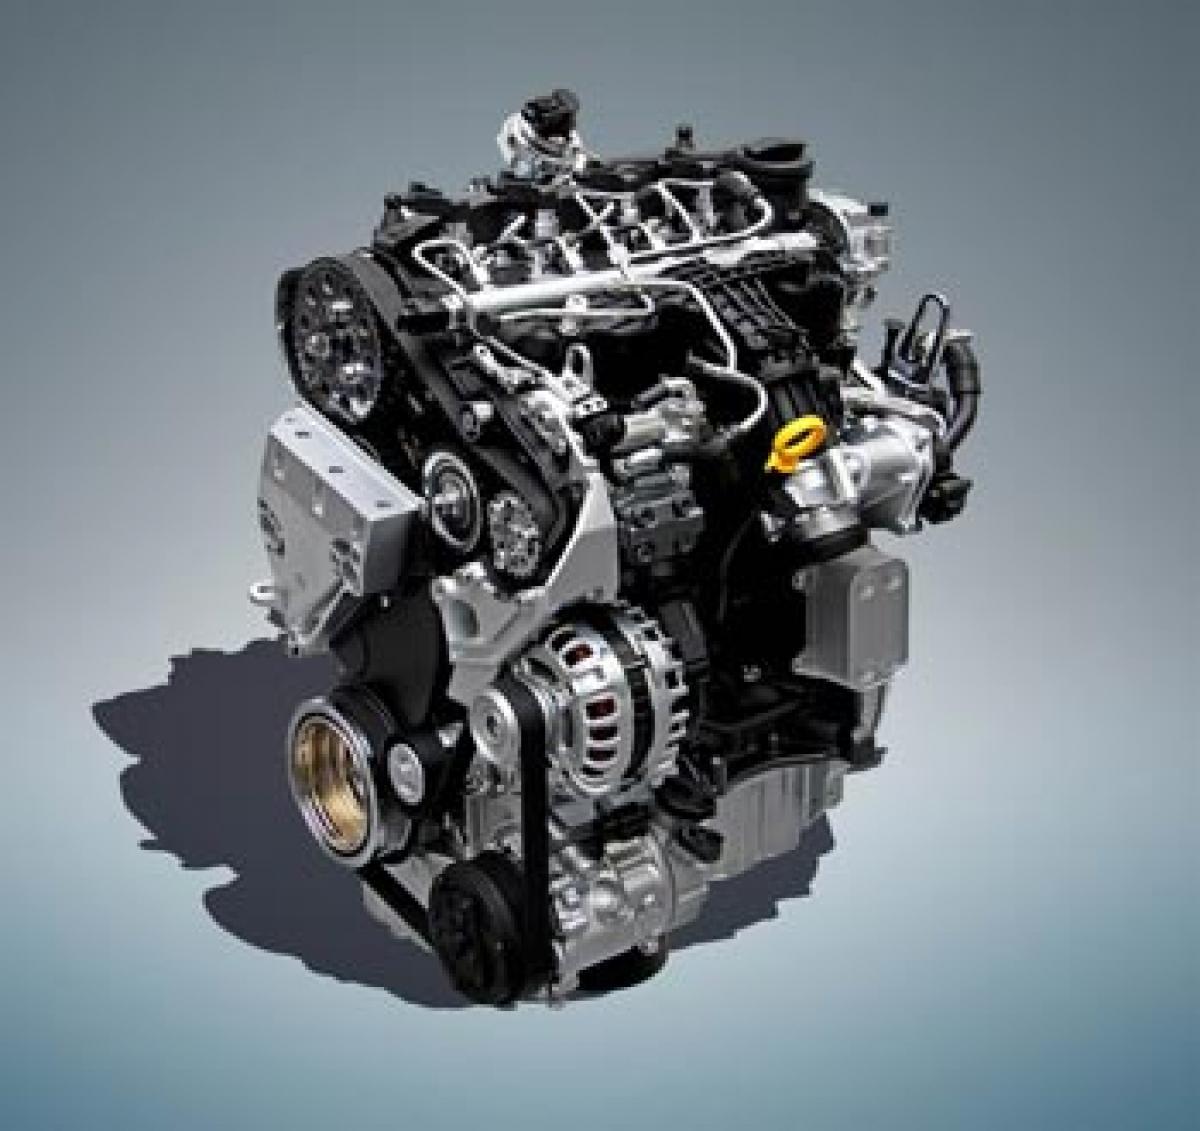 Volkswagen 1.5 diesel engine to get more power